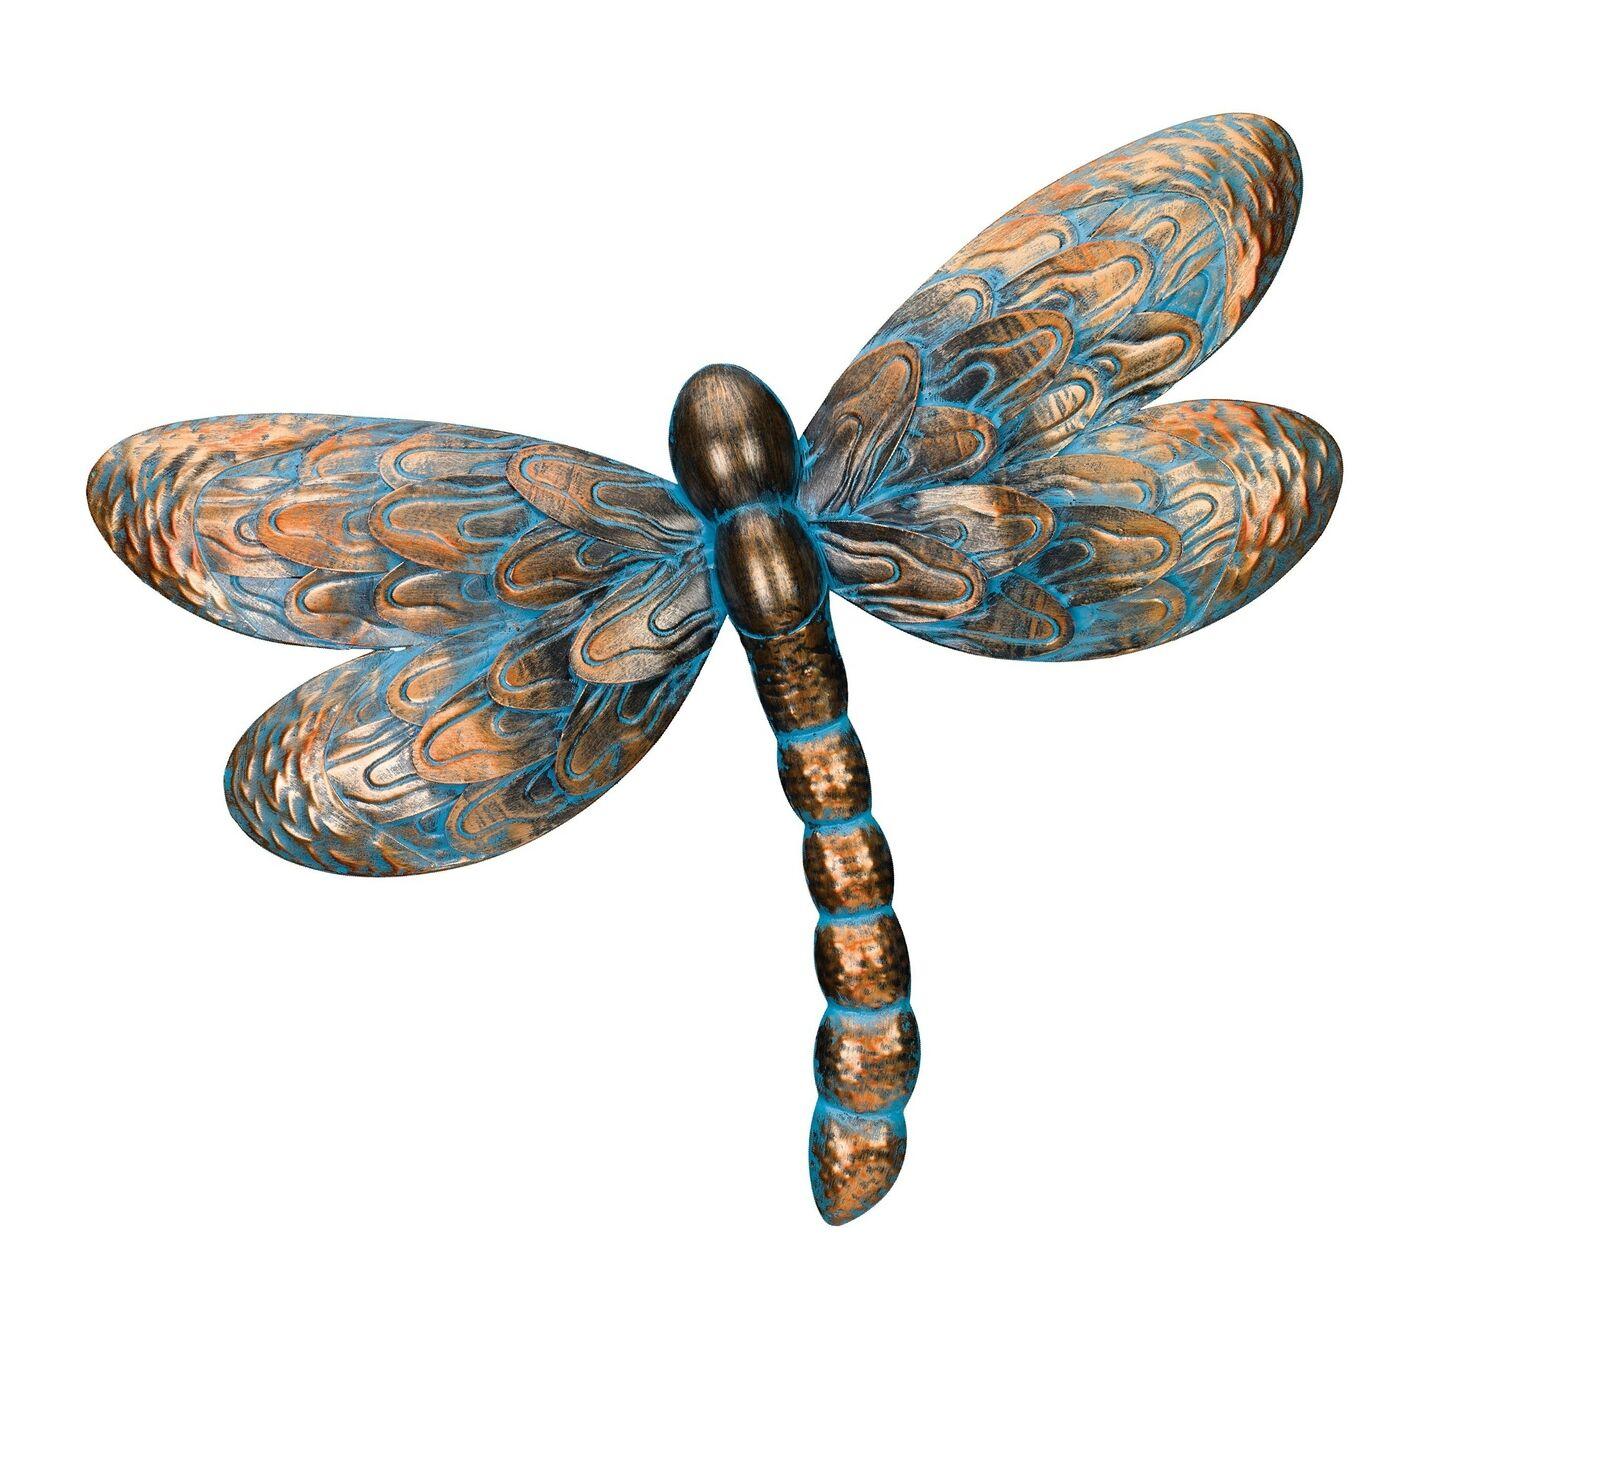 Regal Art & Gift Patina Dragonfly Wall Decor With Dragonfly Wall Decor (Gallery 10 of 30)